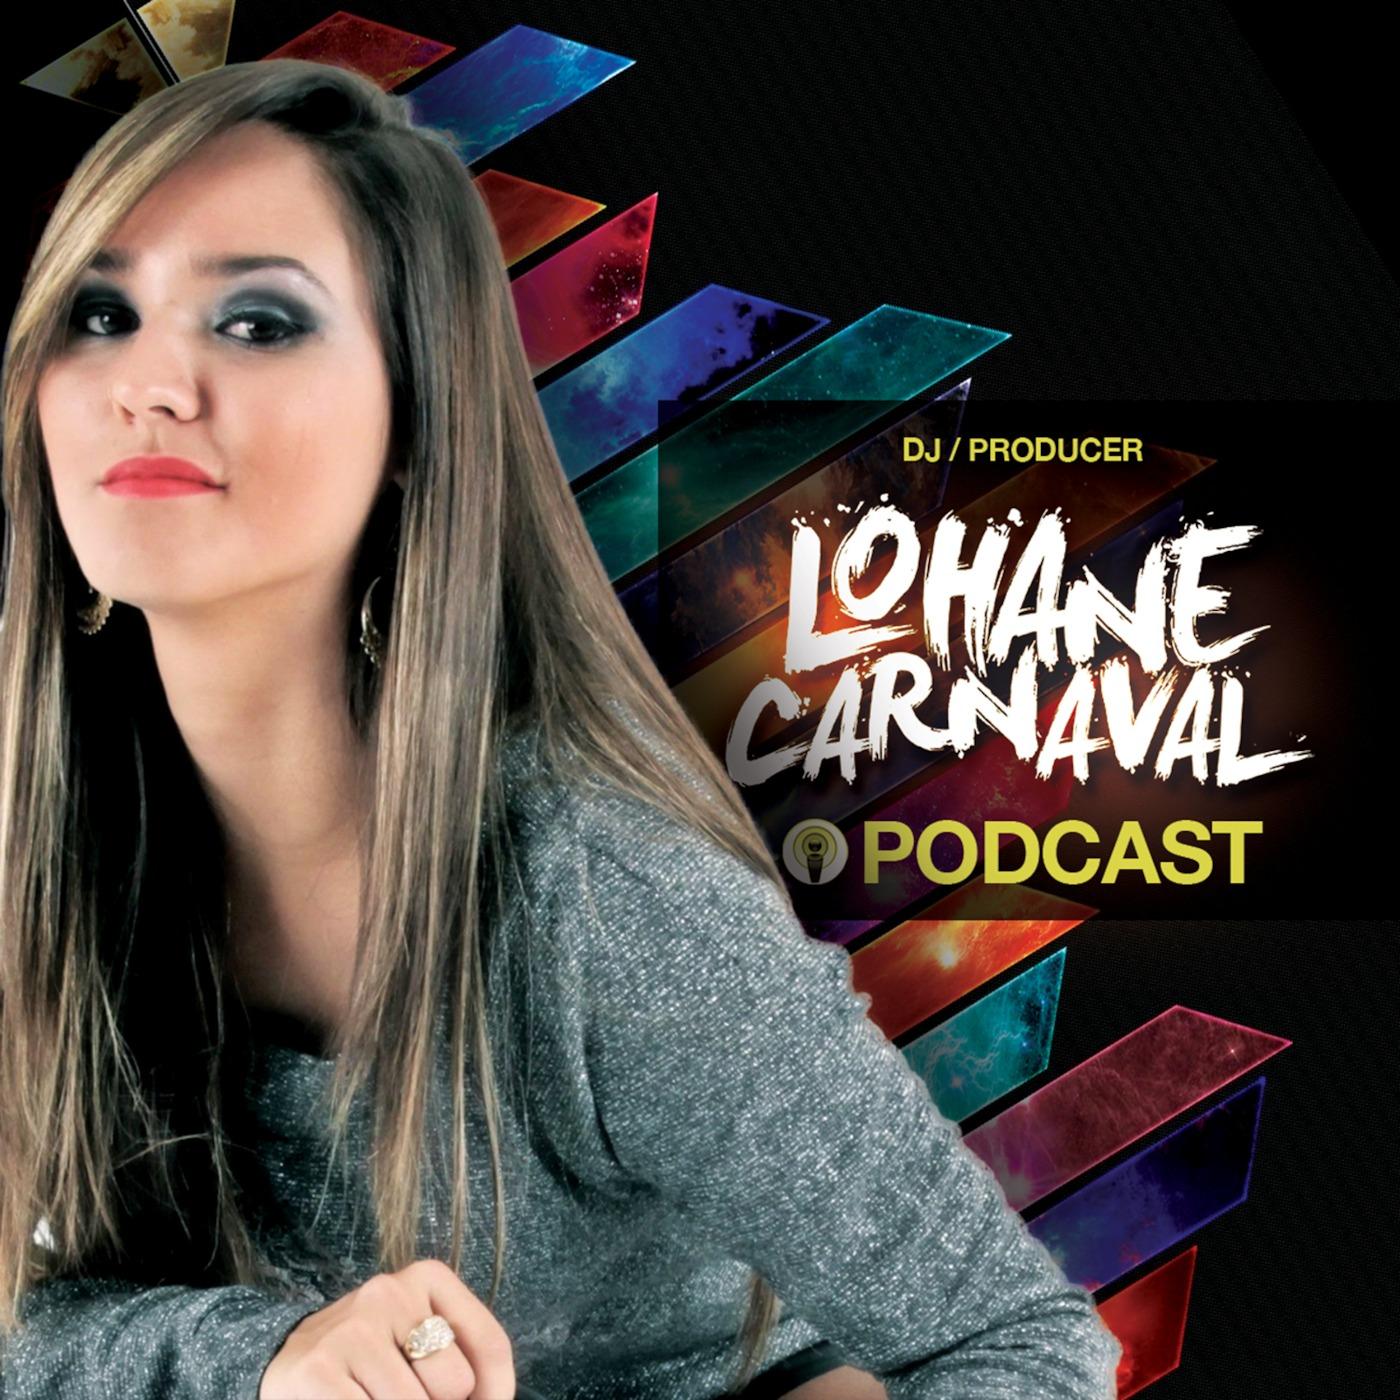 LohaneCarnaval's Podcast